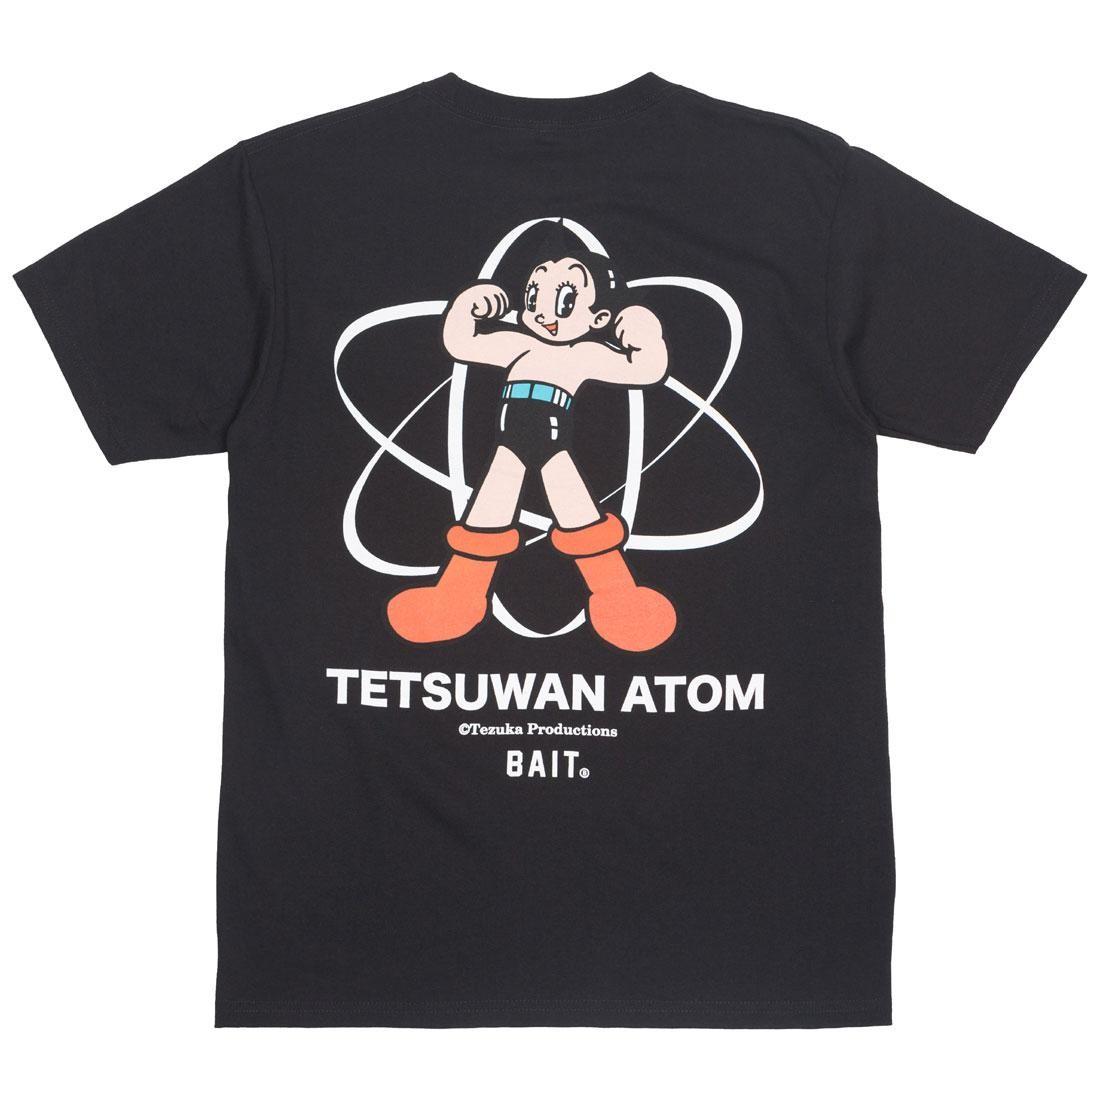 BAIT x Astro Boy Men Tetsuwan Atom Tee (black)